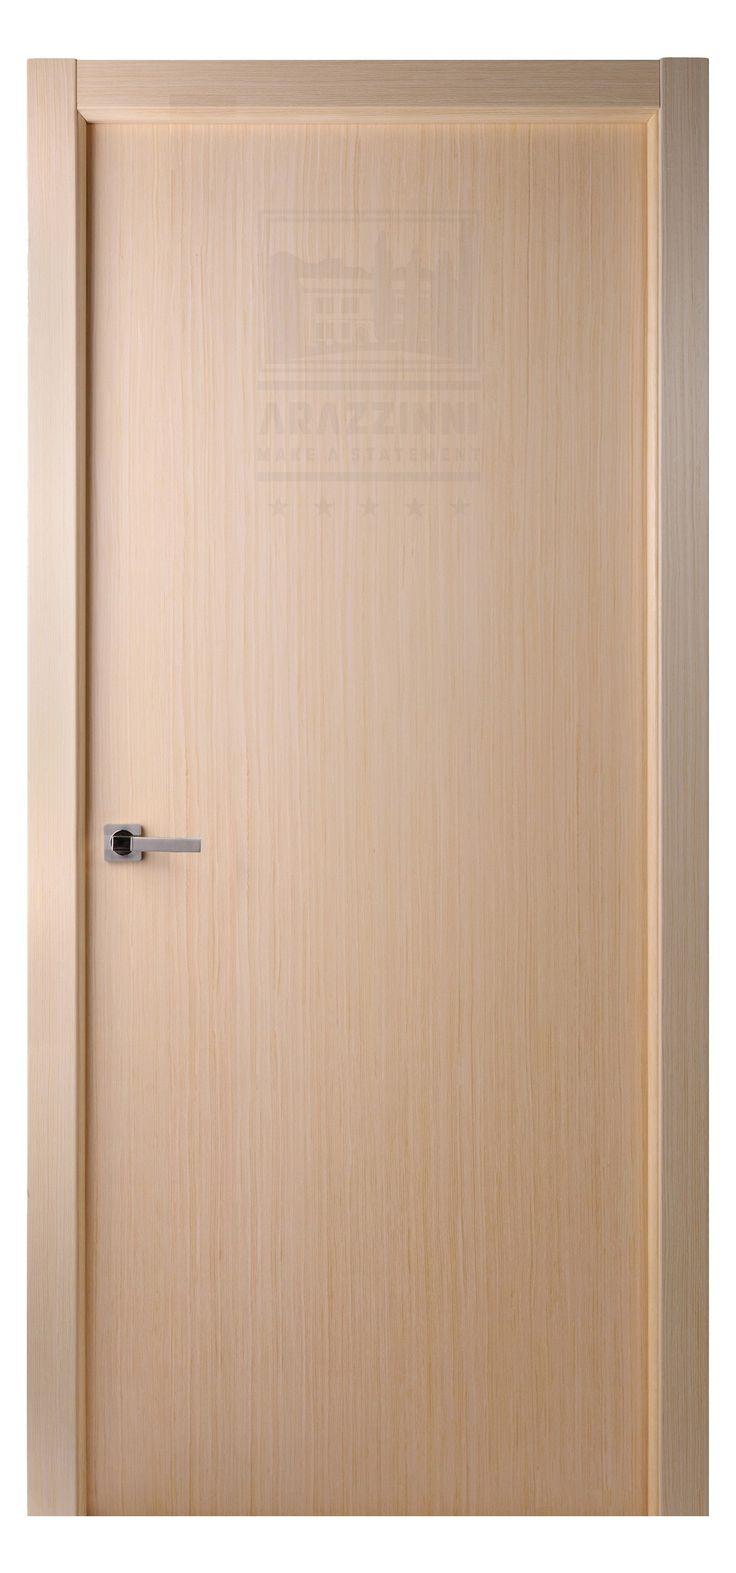 Arazzinni classica ultra 8 ft interior door bleached oak for Interior 8 foot doors